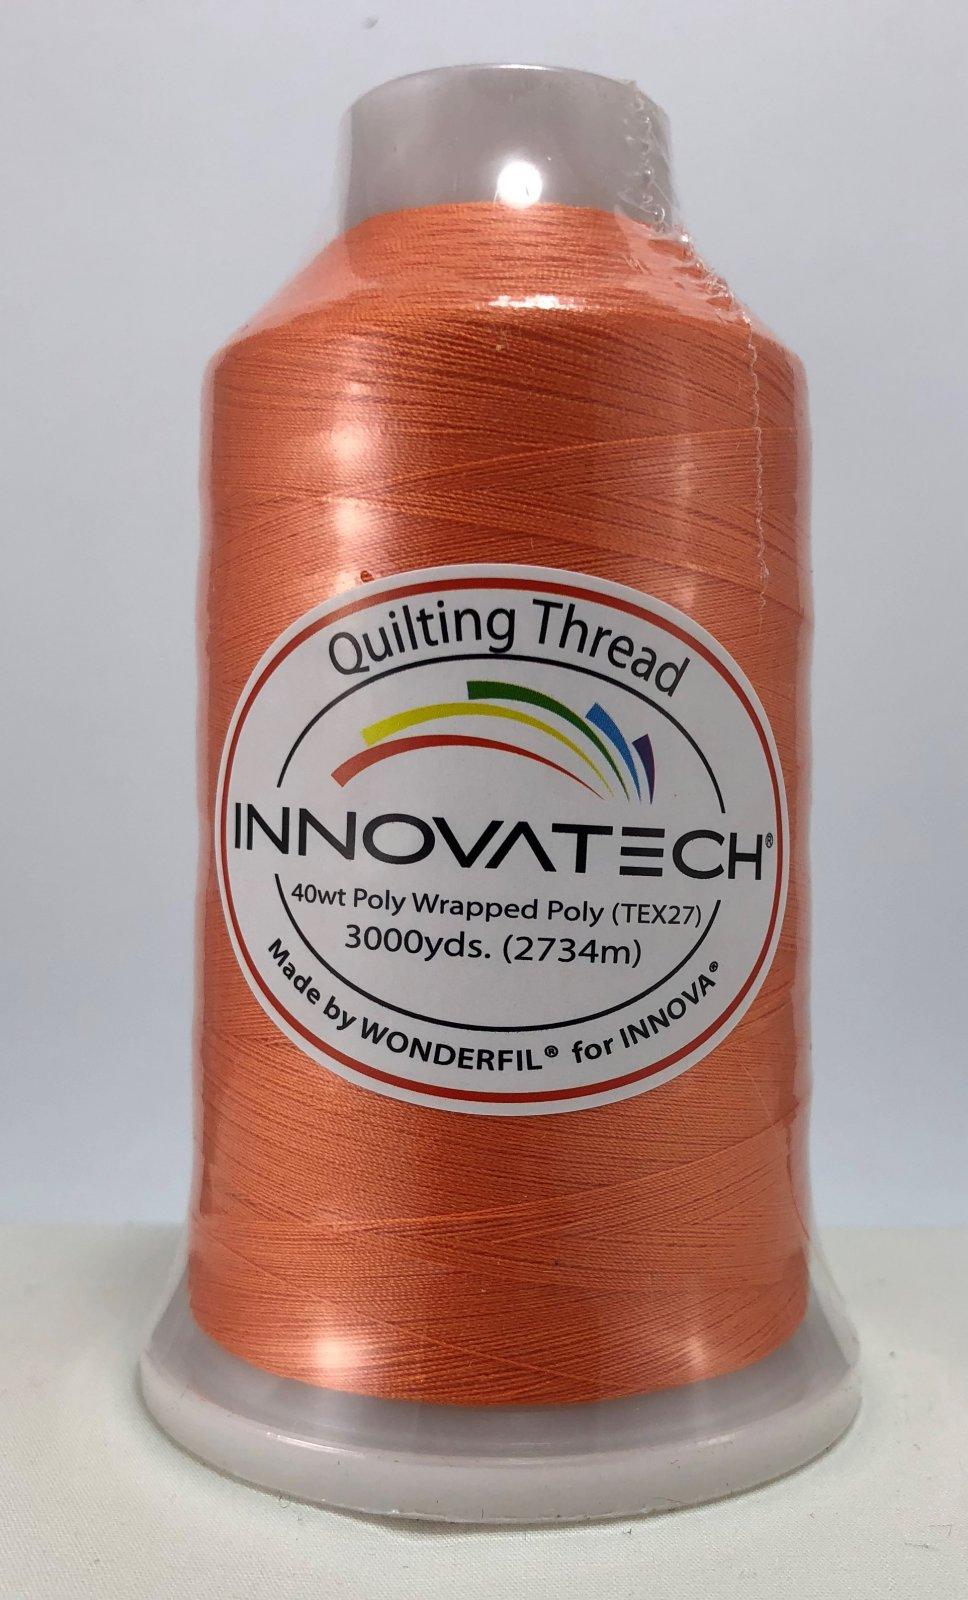 Innovatech PW04 COLORADO